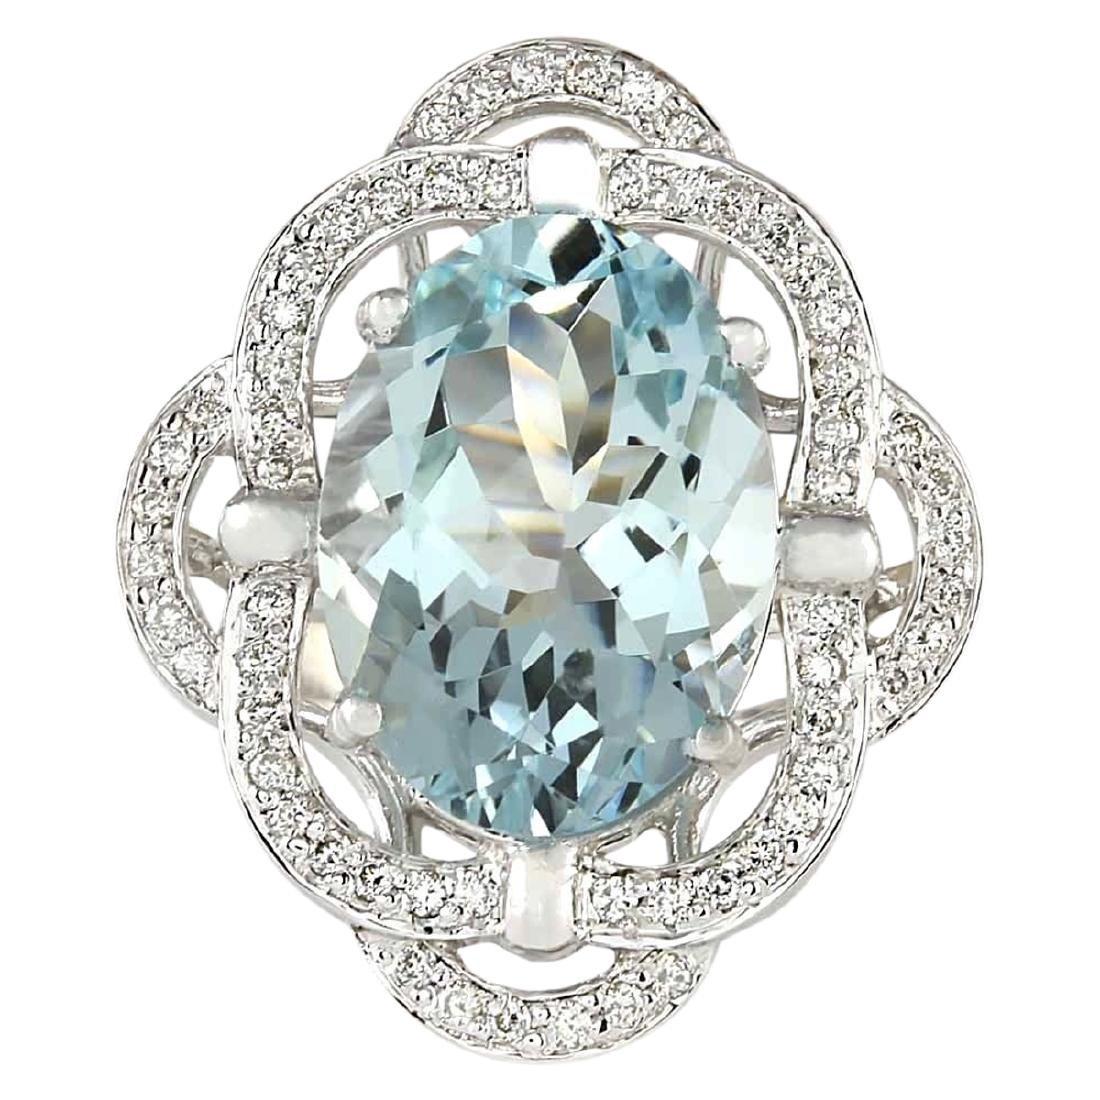 6.97 CTW Natural Aquamarine And Diamond Ring In 18K